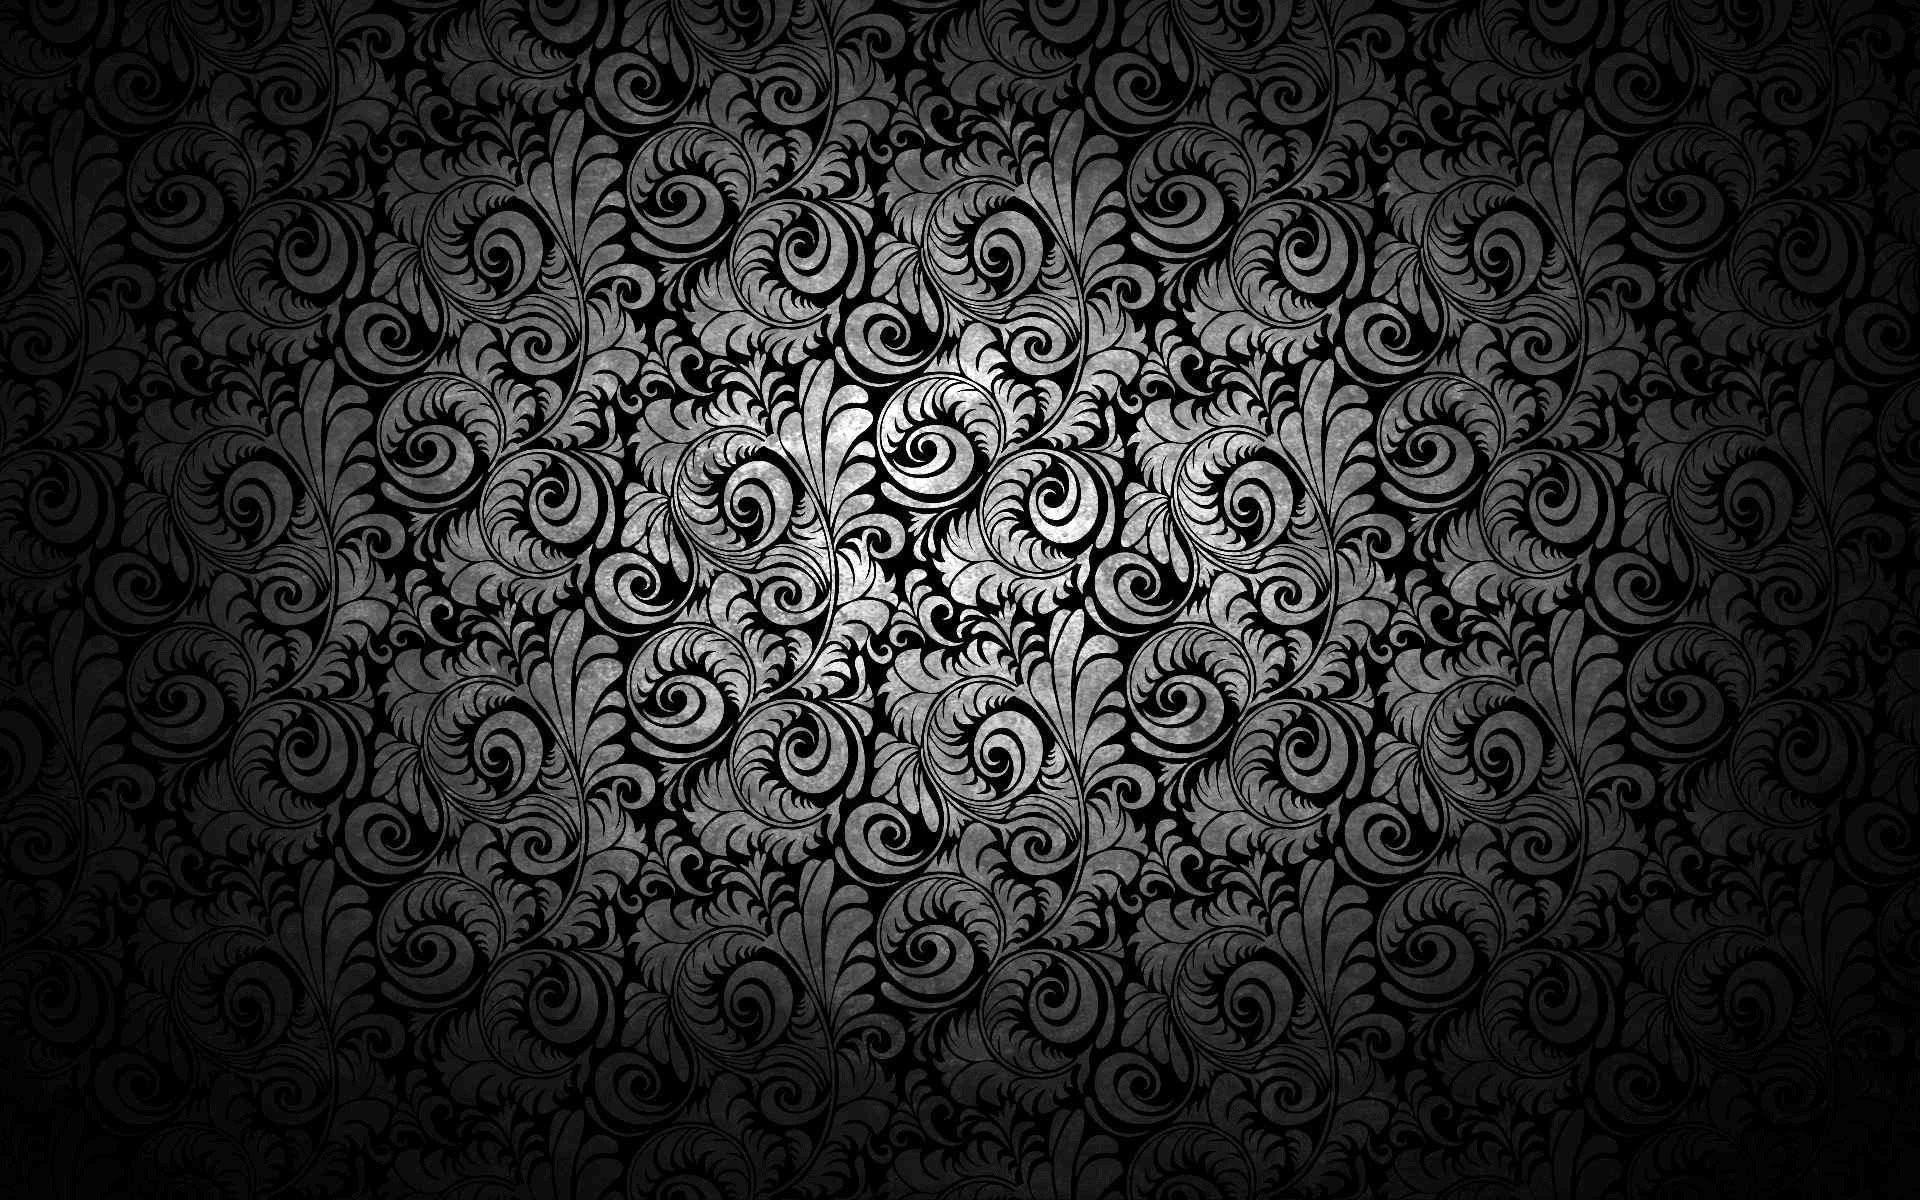 Black Elegant Wallpaper ·① WallpaperTagBlack And White Elegant Backgrounds